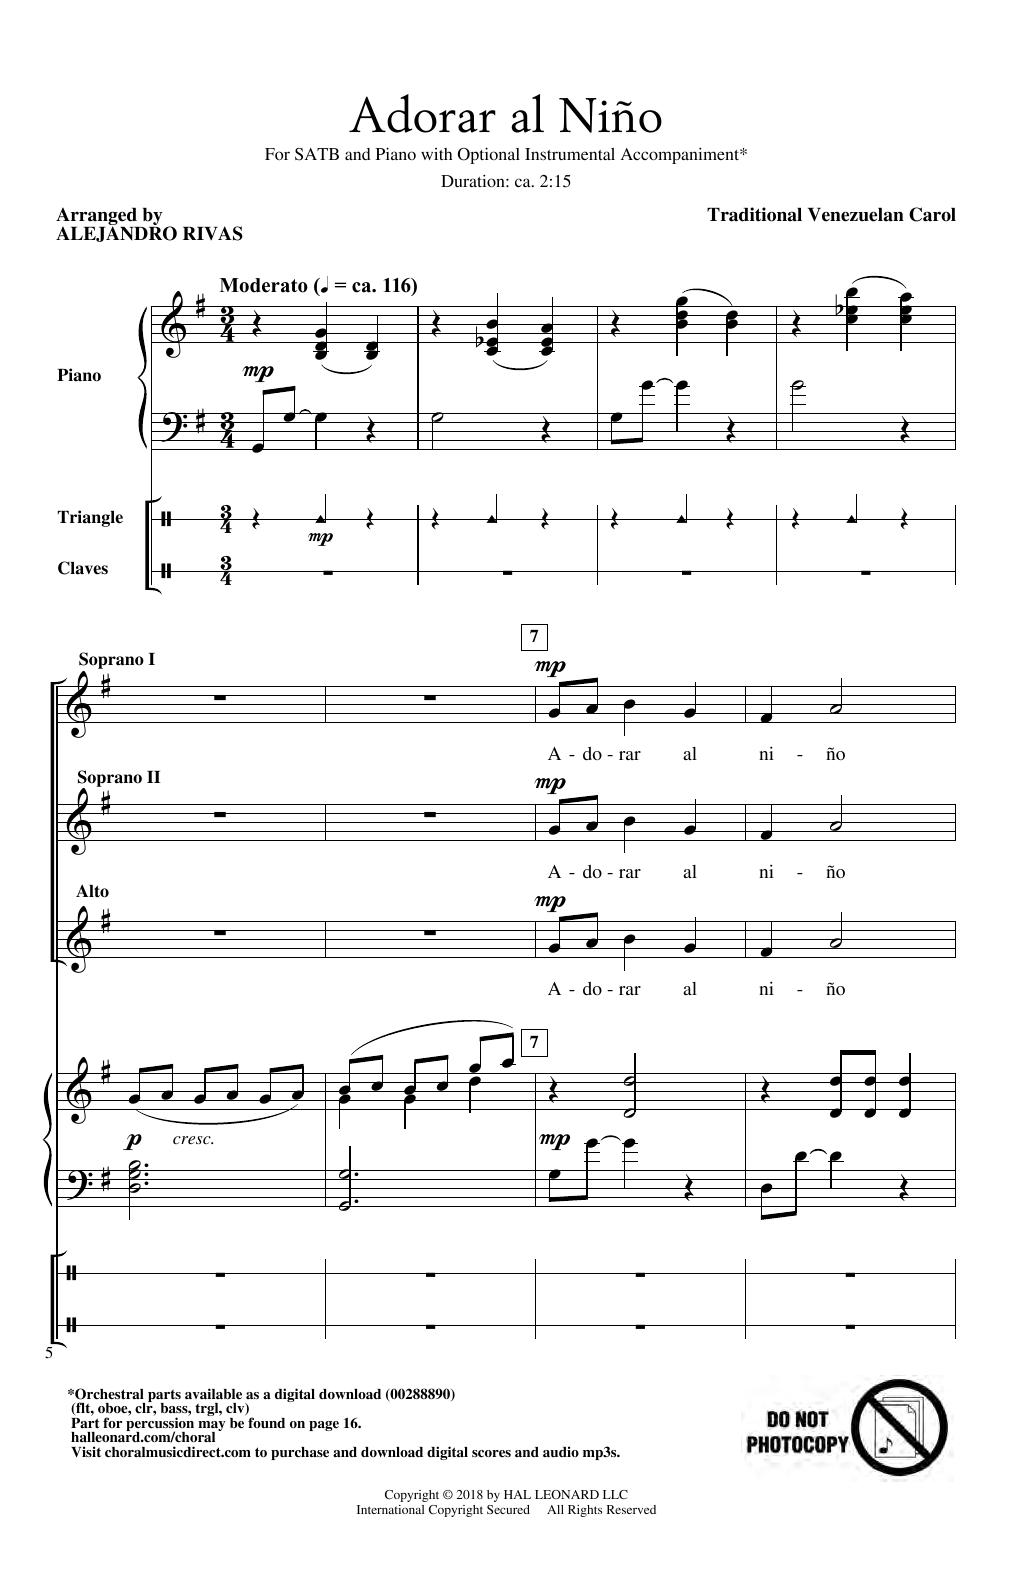 Download Alejandro Rivas 'Adorar Al Nino' Digital Sheet Music Notes & Chords and start playing in minutes